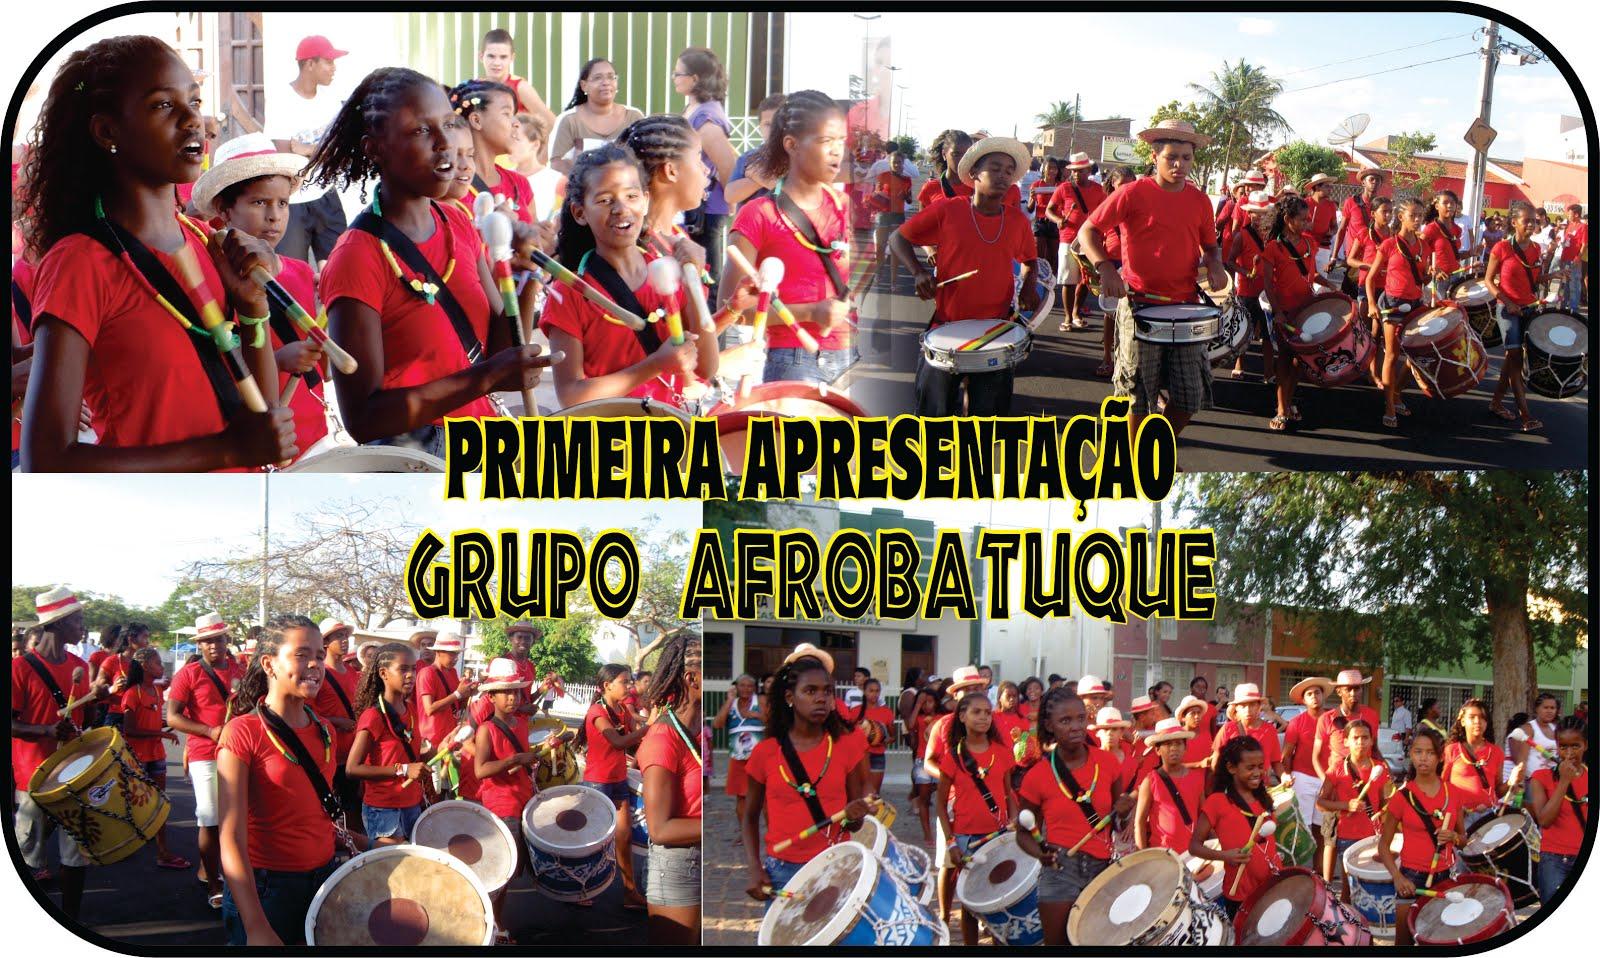 GRUPO MARACATU AFROBATUQUE